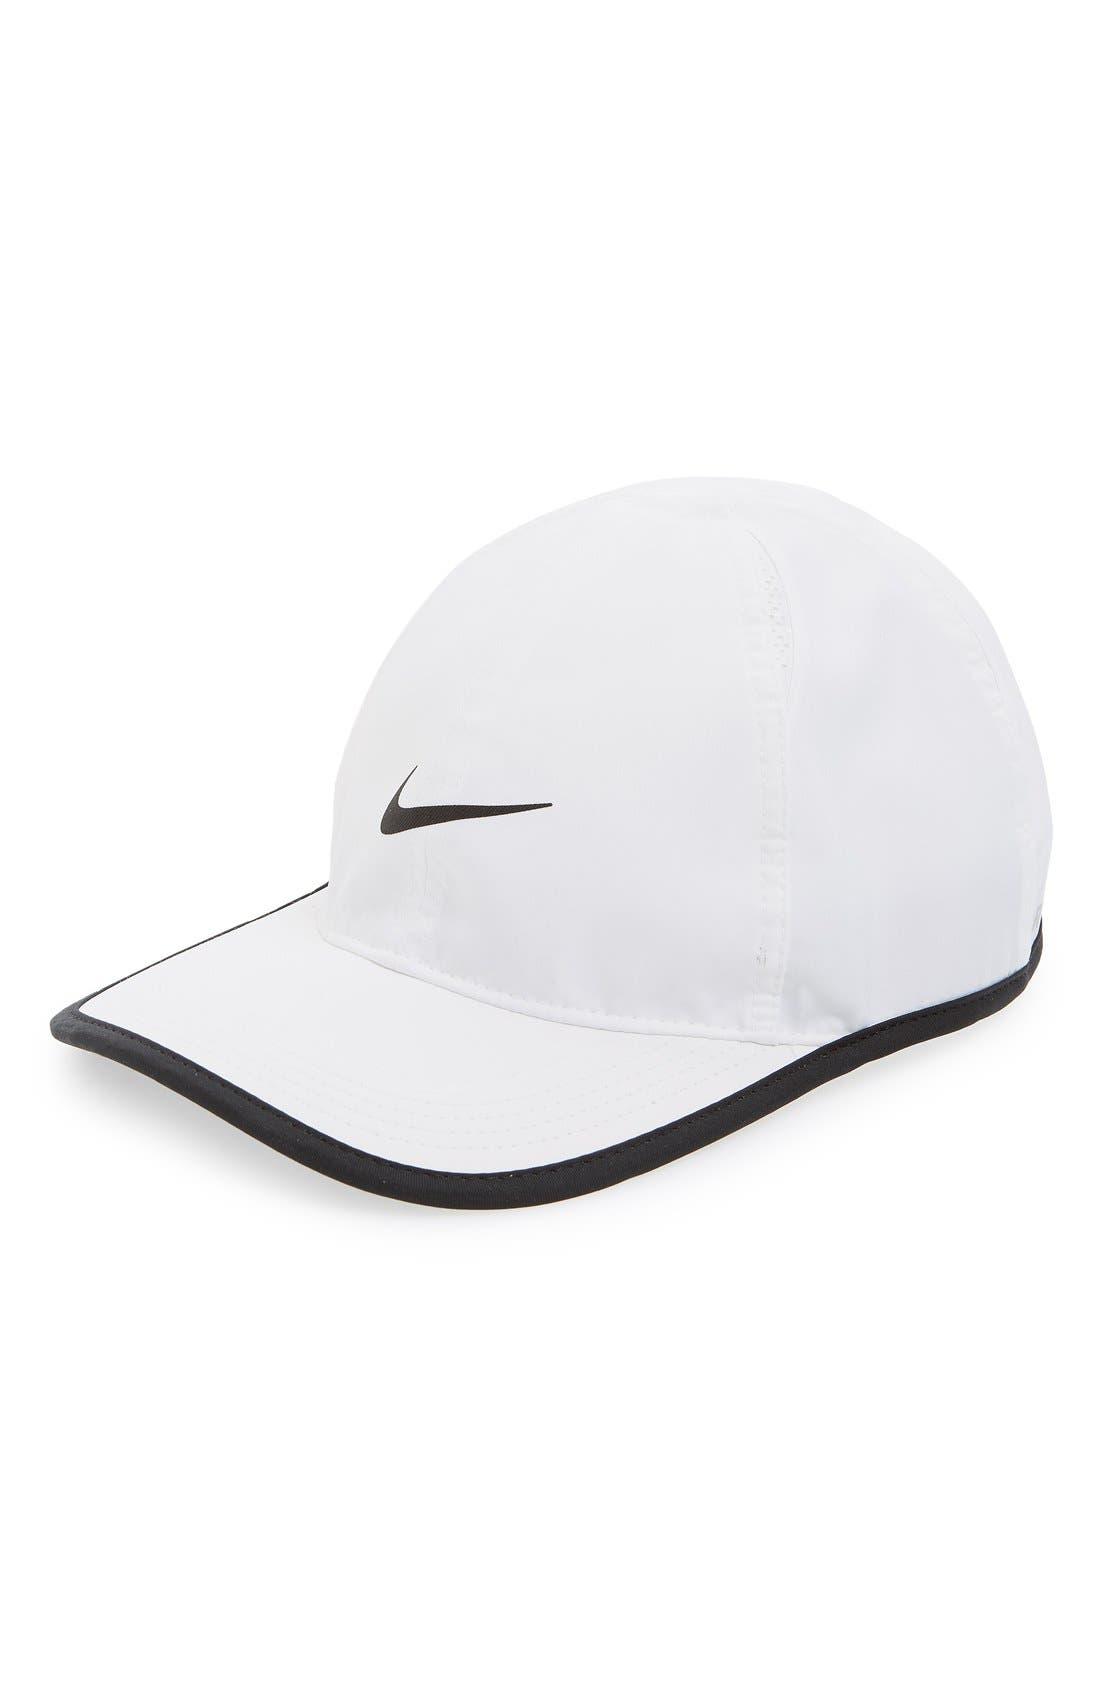 Alternate Image 1 Selected - Nike 'Featherlight' Baseball Cap